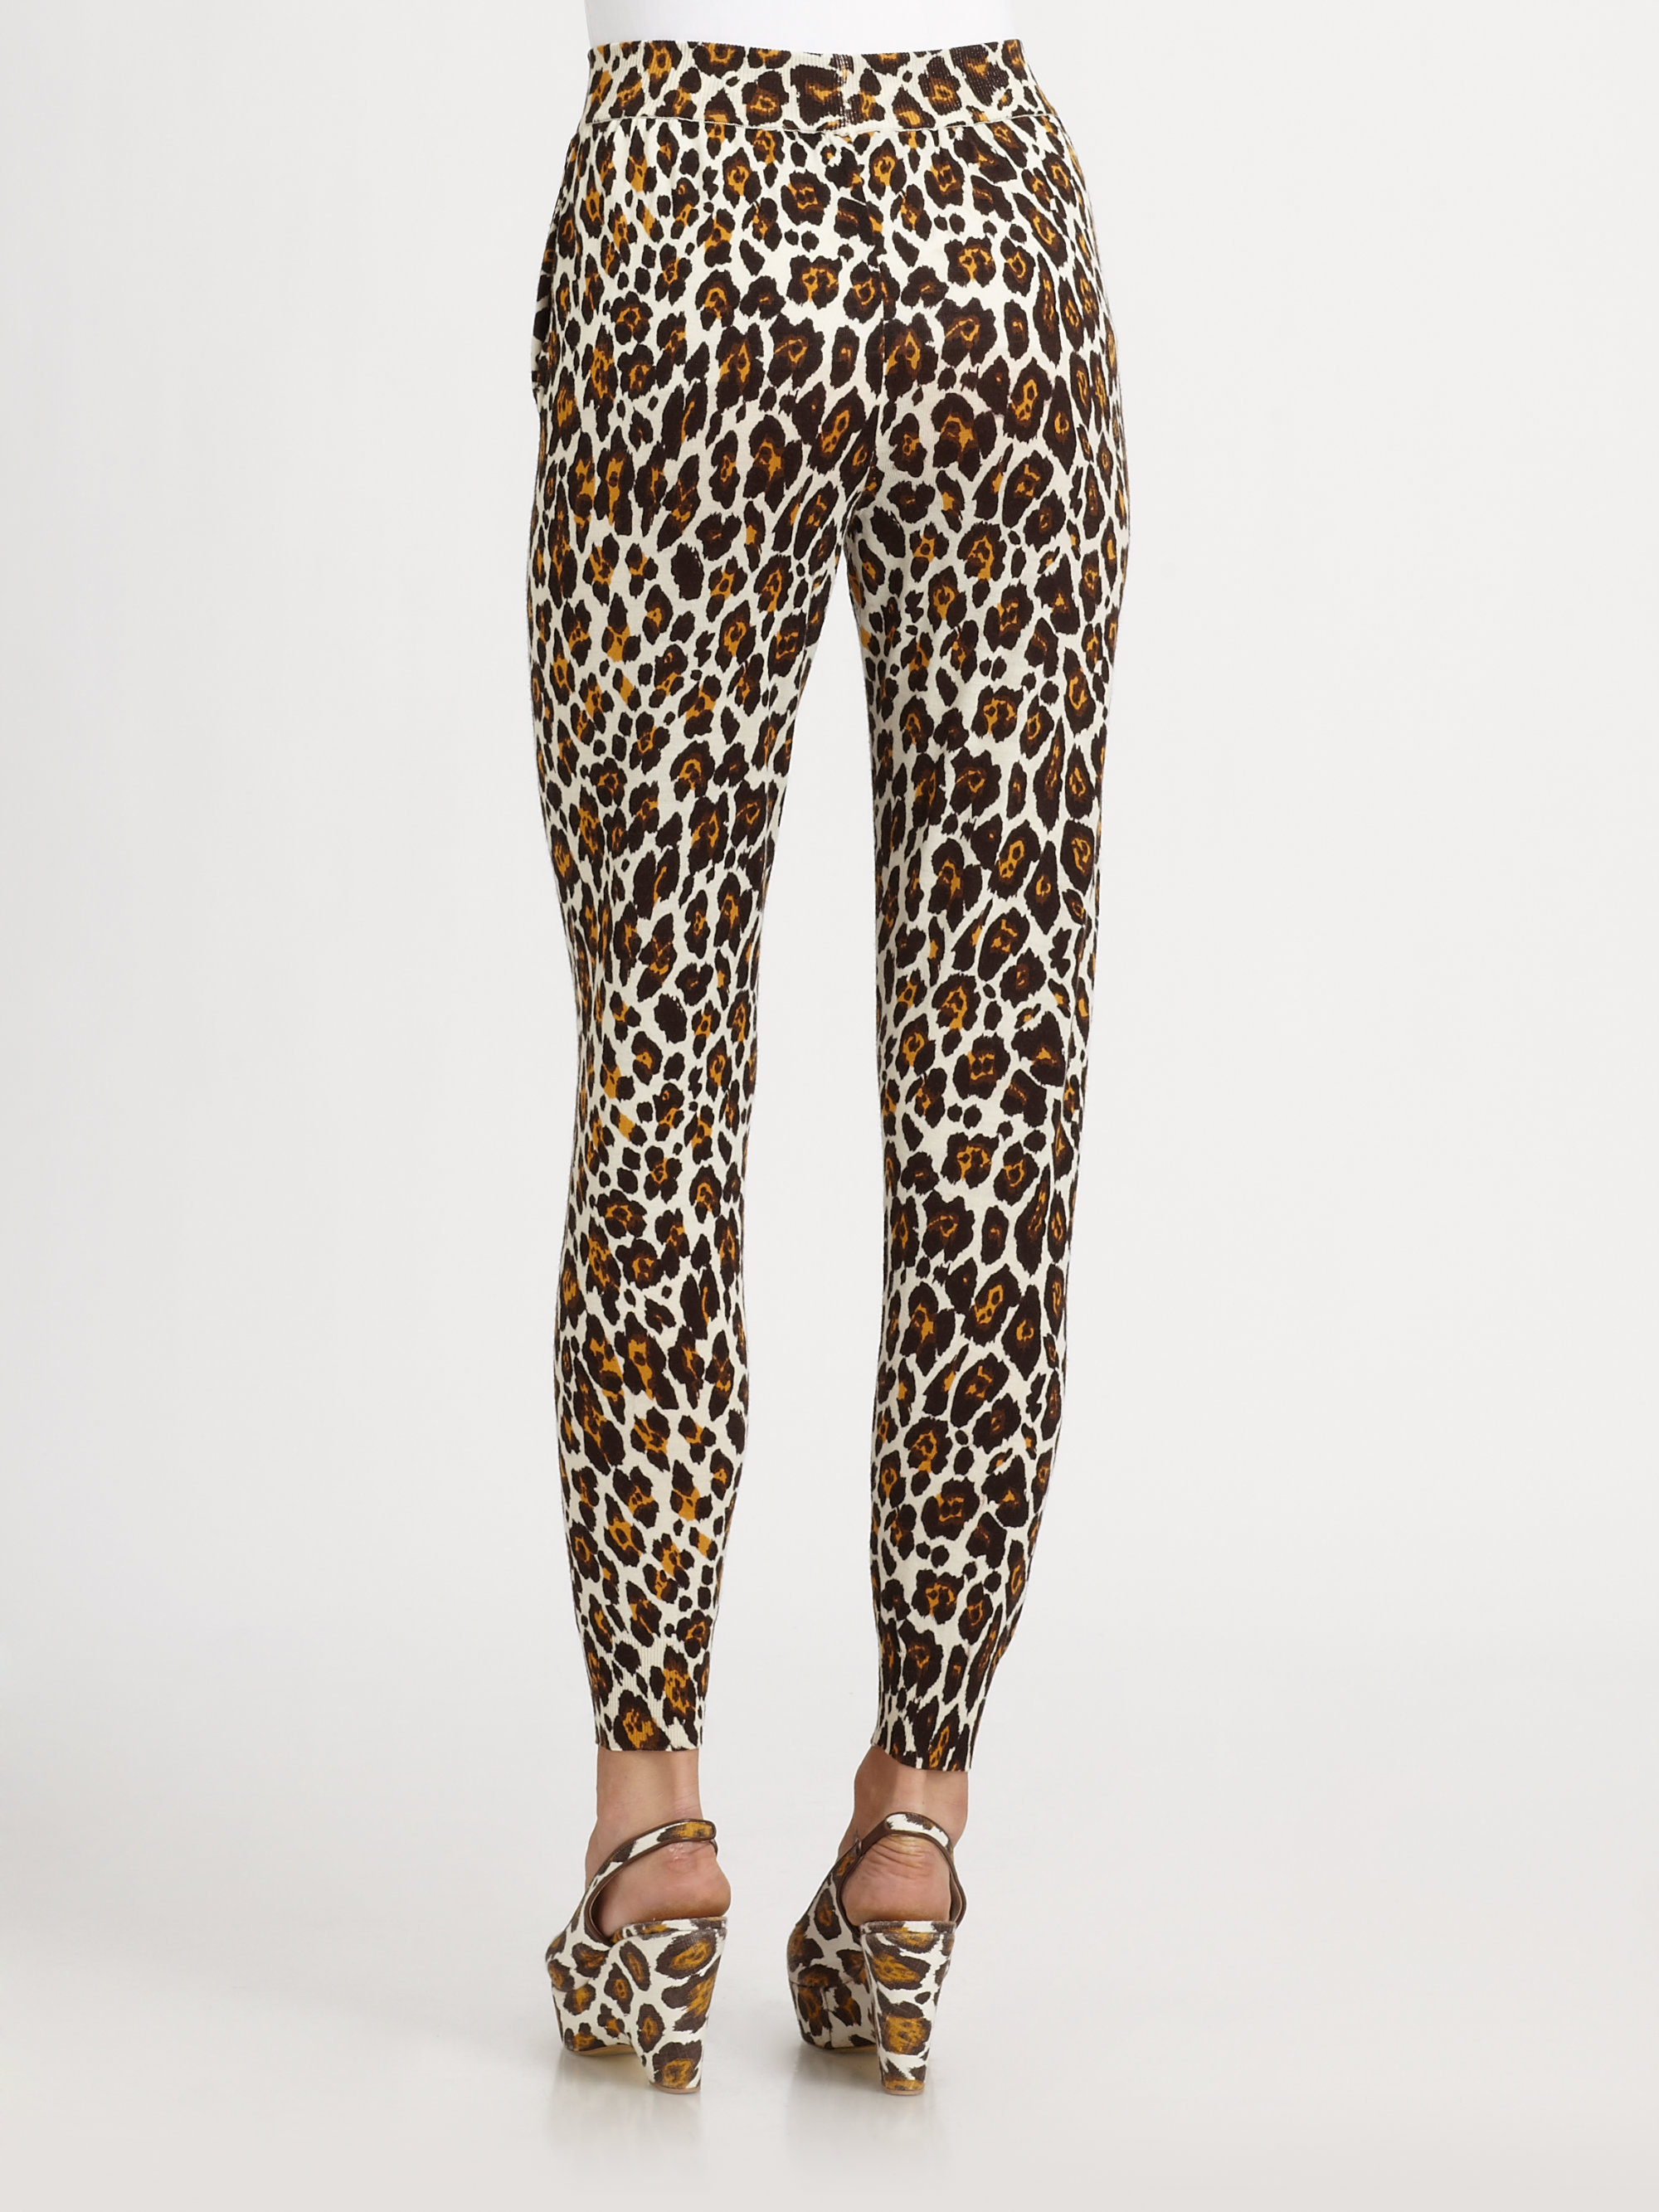 Lyst Stella Mccartney Leopard Print Jogging Pants In Brown